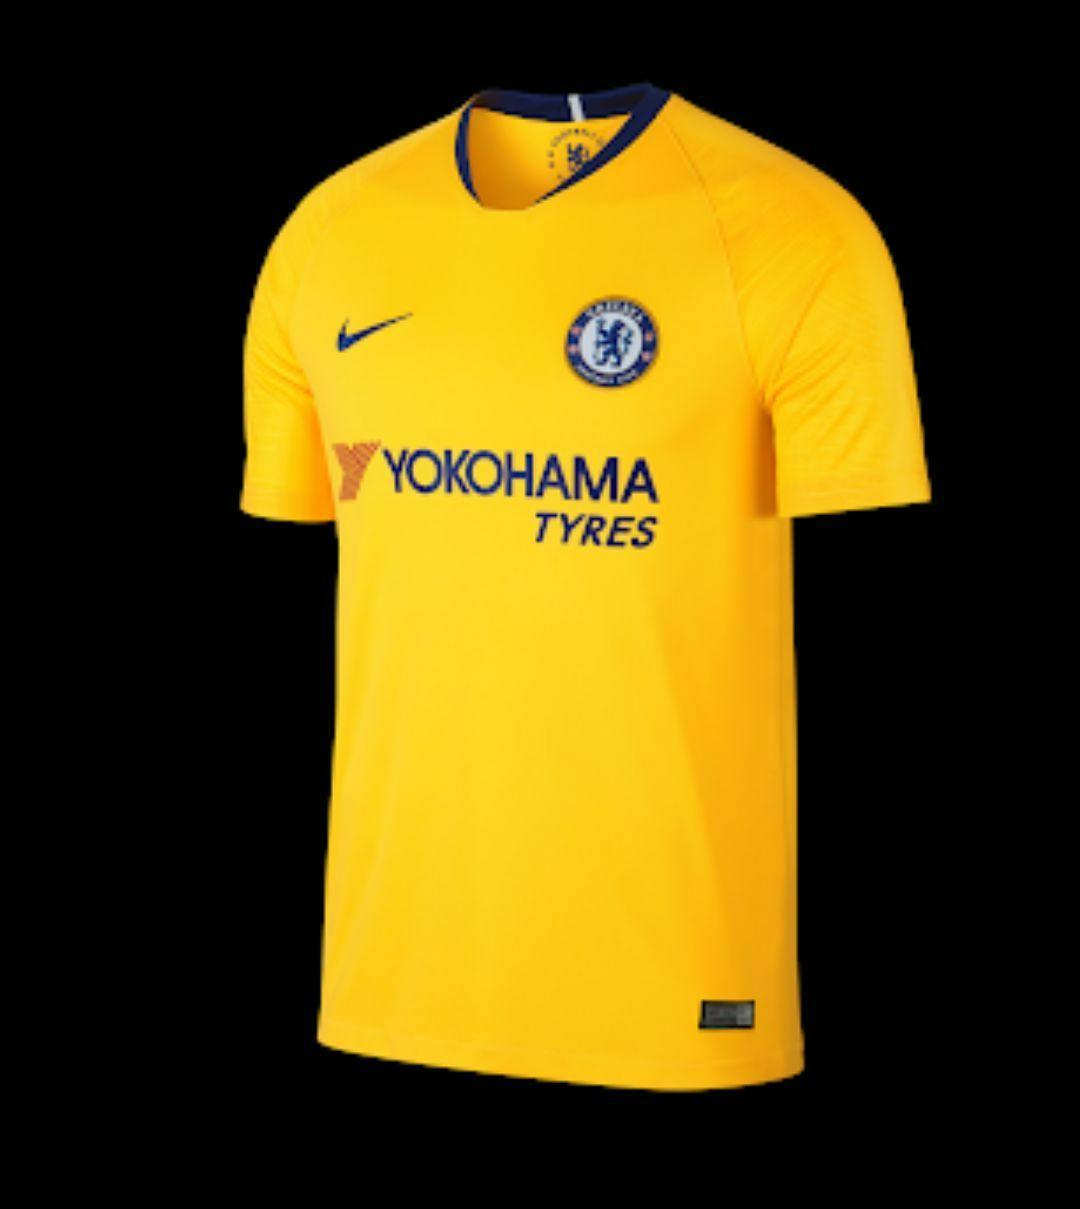 Cs - Jersey bola Chelsea away 2018/19 new